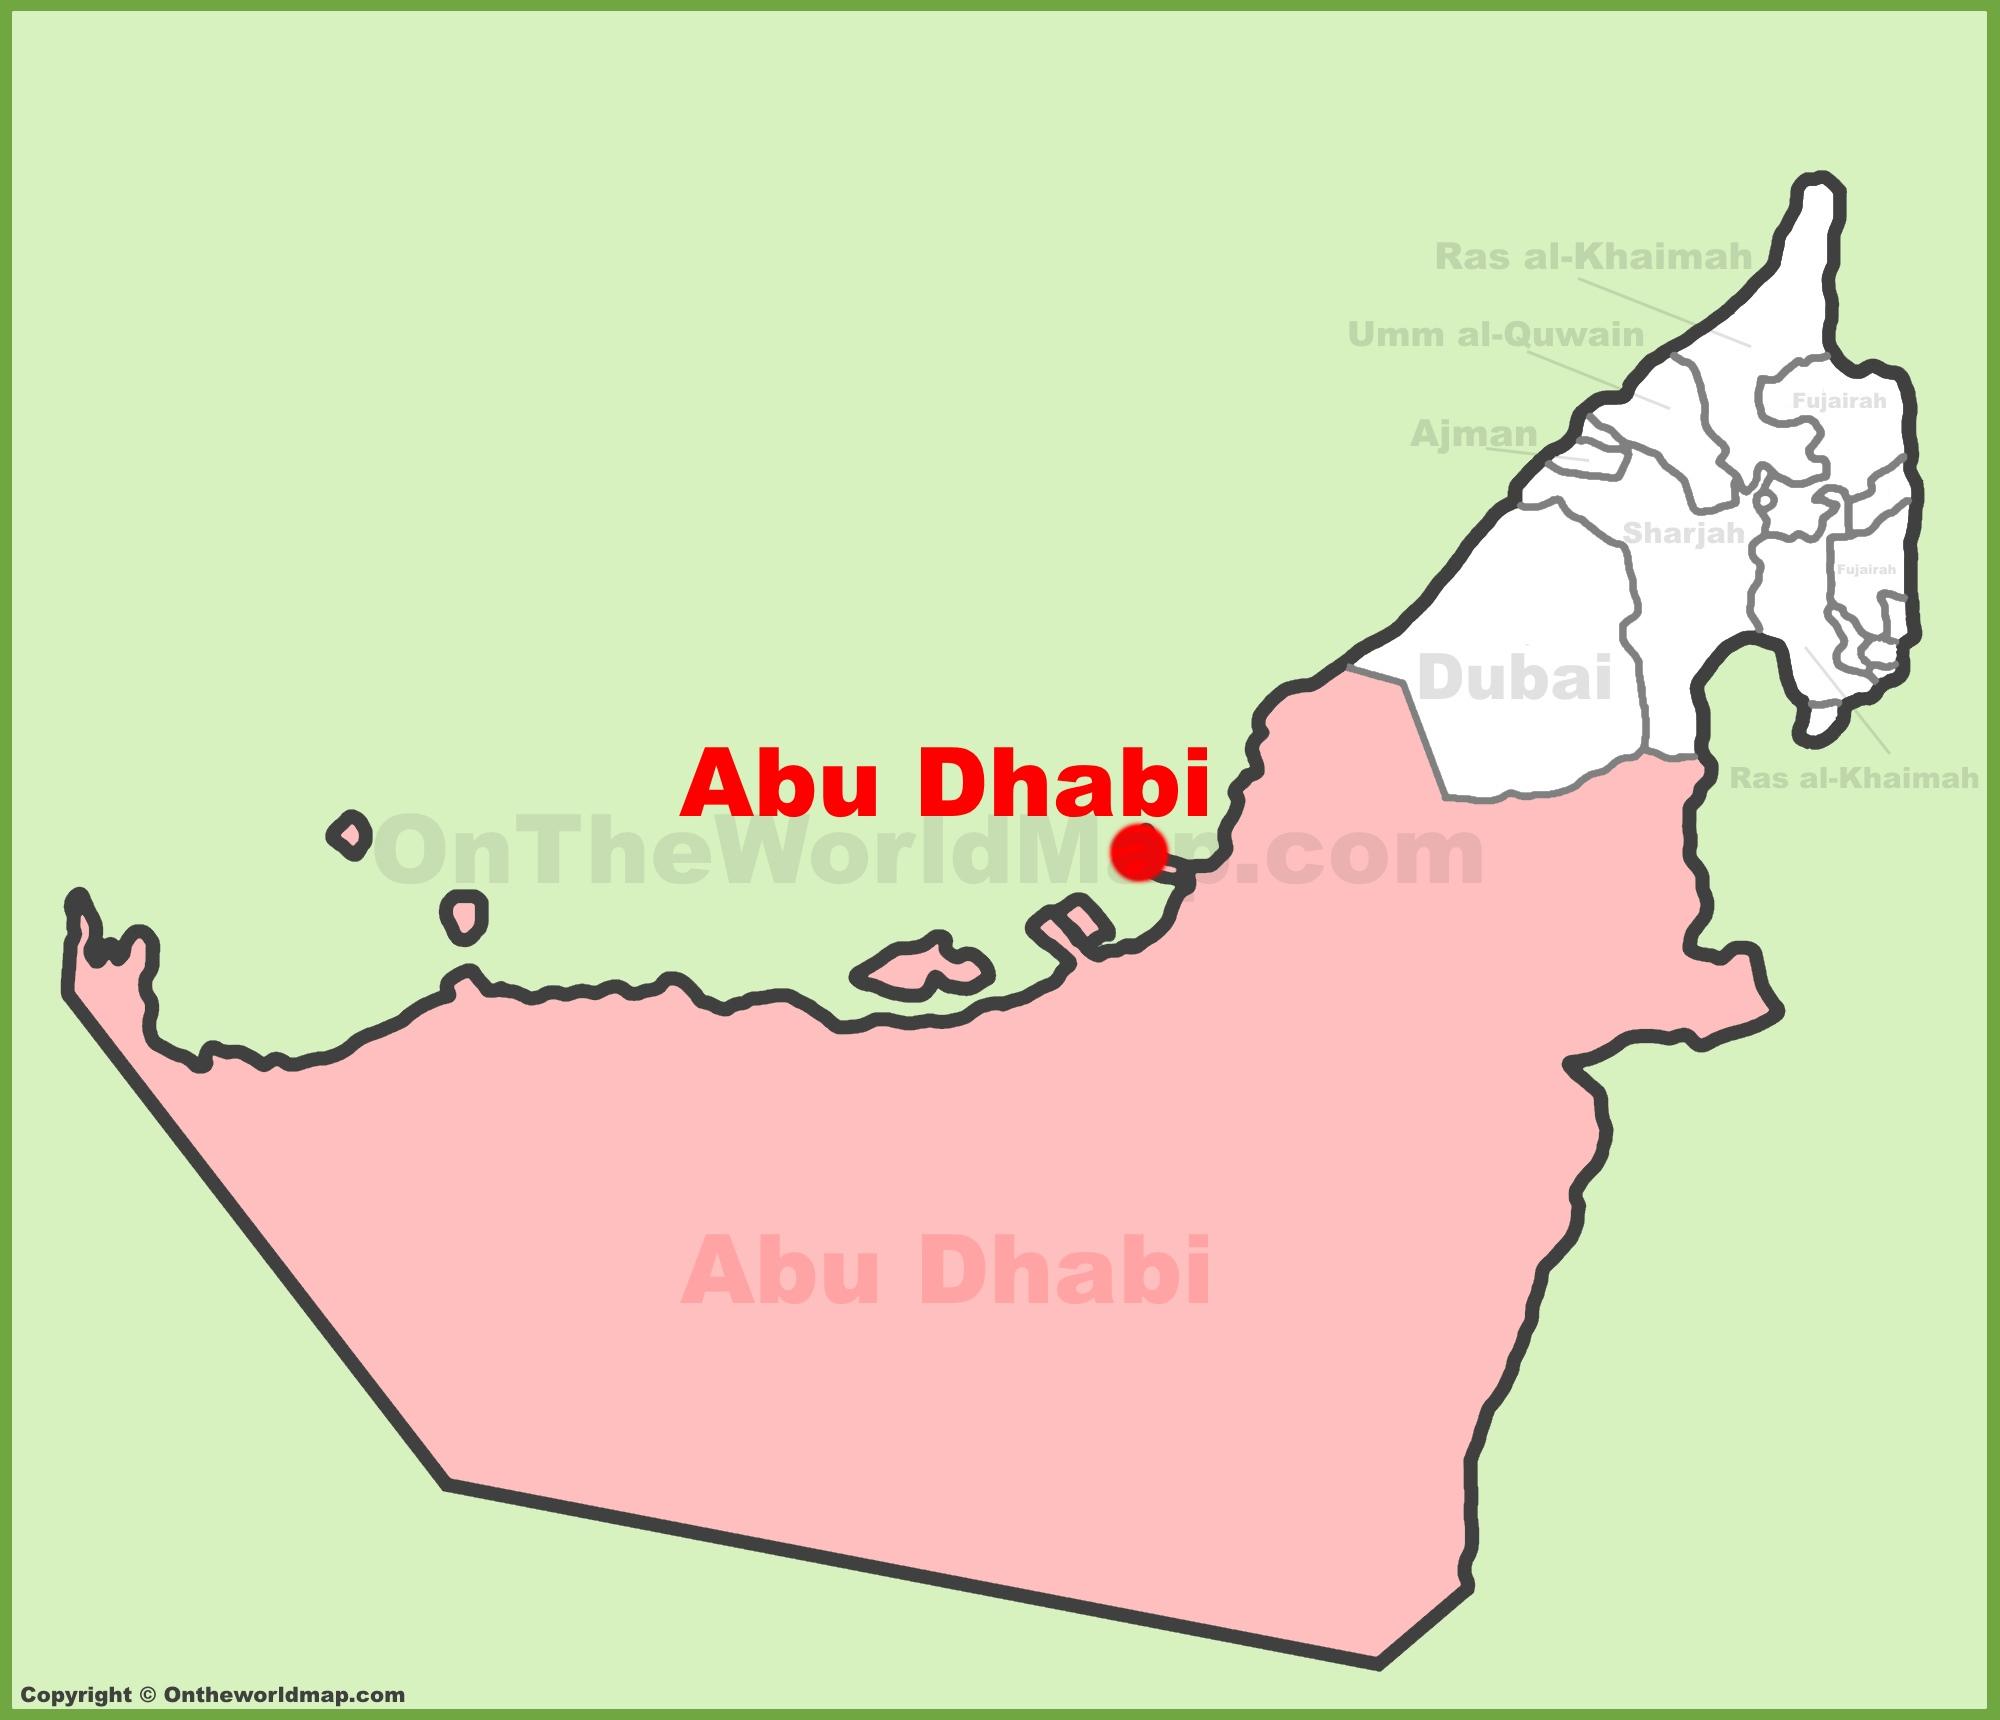 Abu Dhabi Map Abu Dhabi Maps | UAE | Maps of Abu Dhabi Abu Dhabi Map